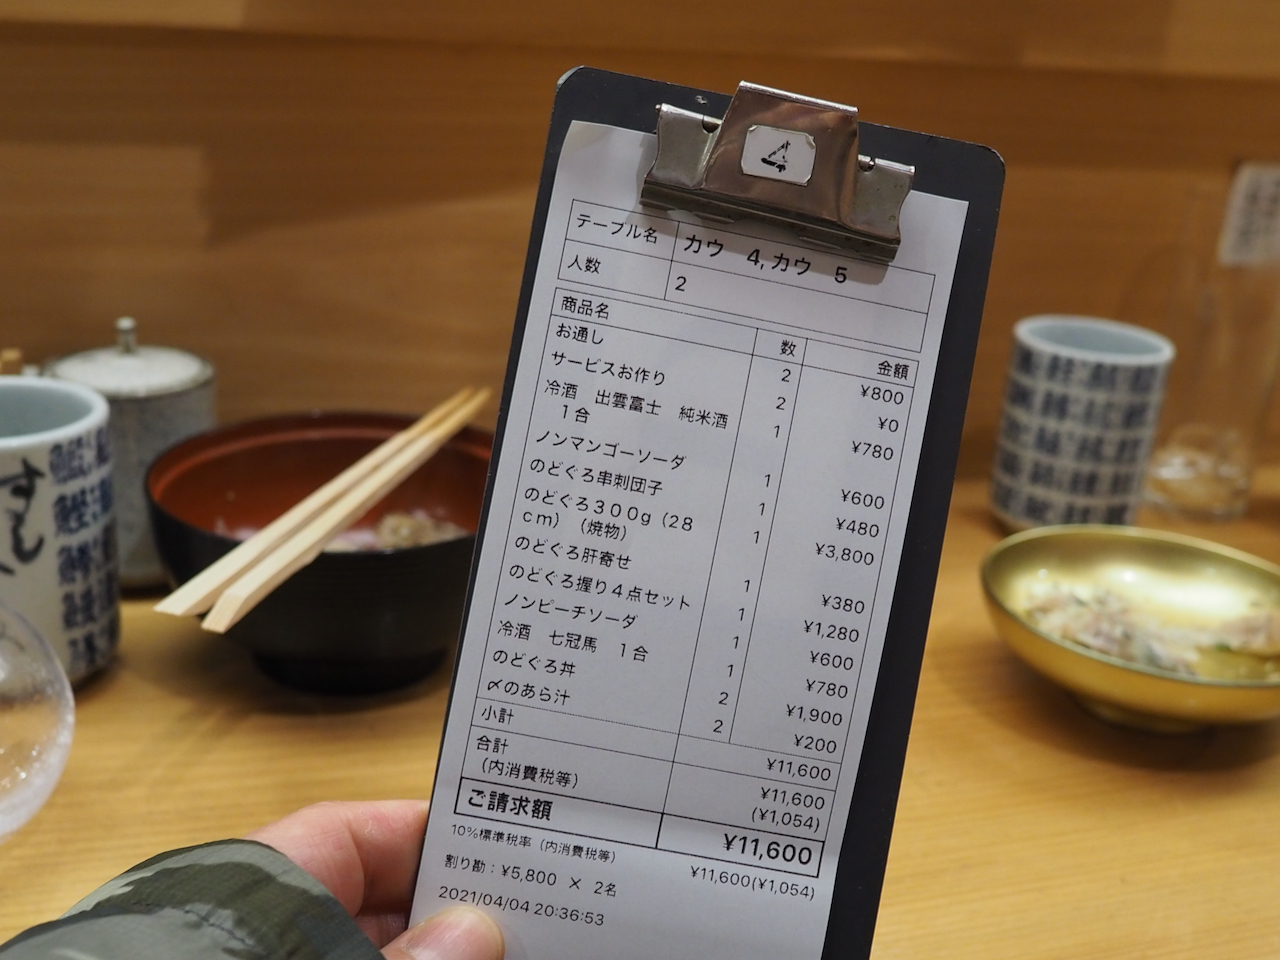 Nodokuro_2104-121.jpeg